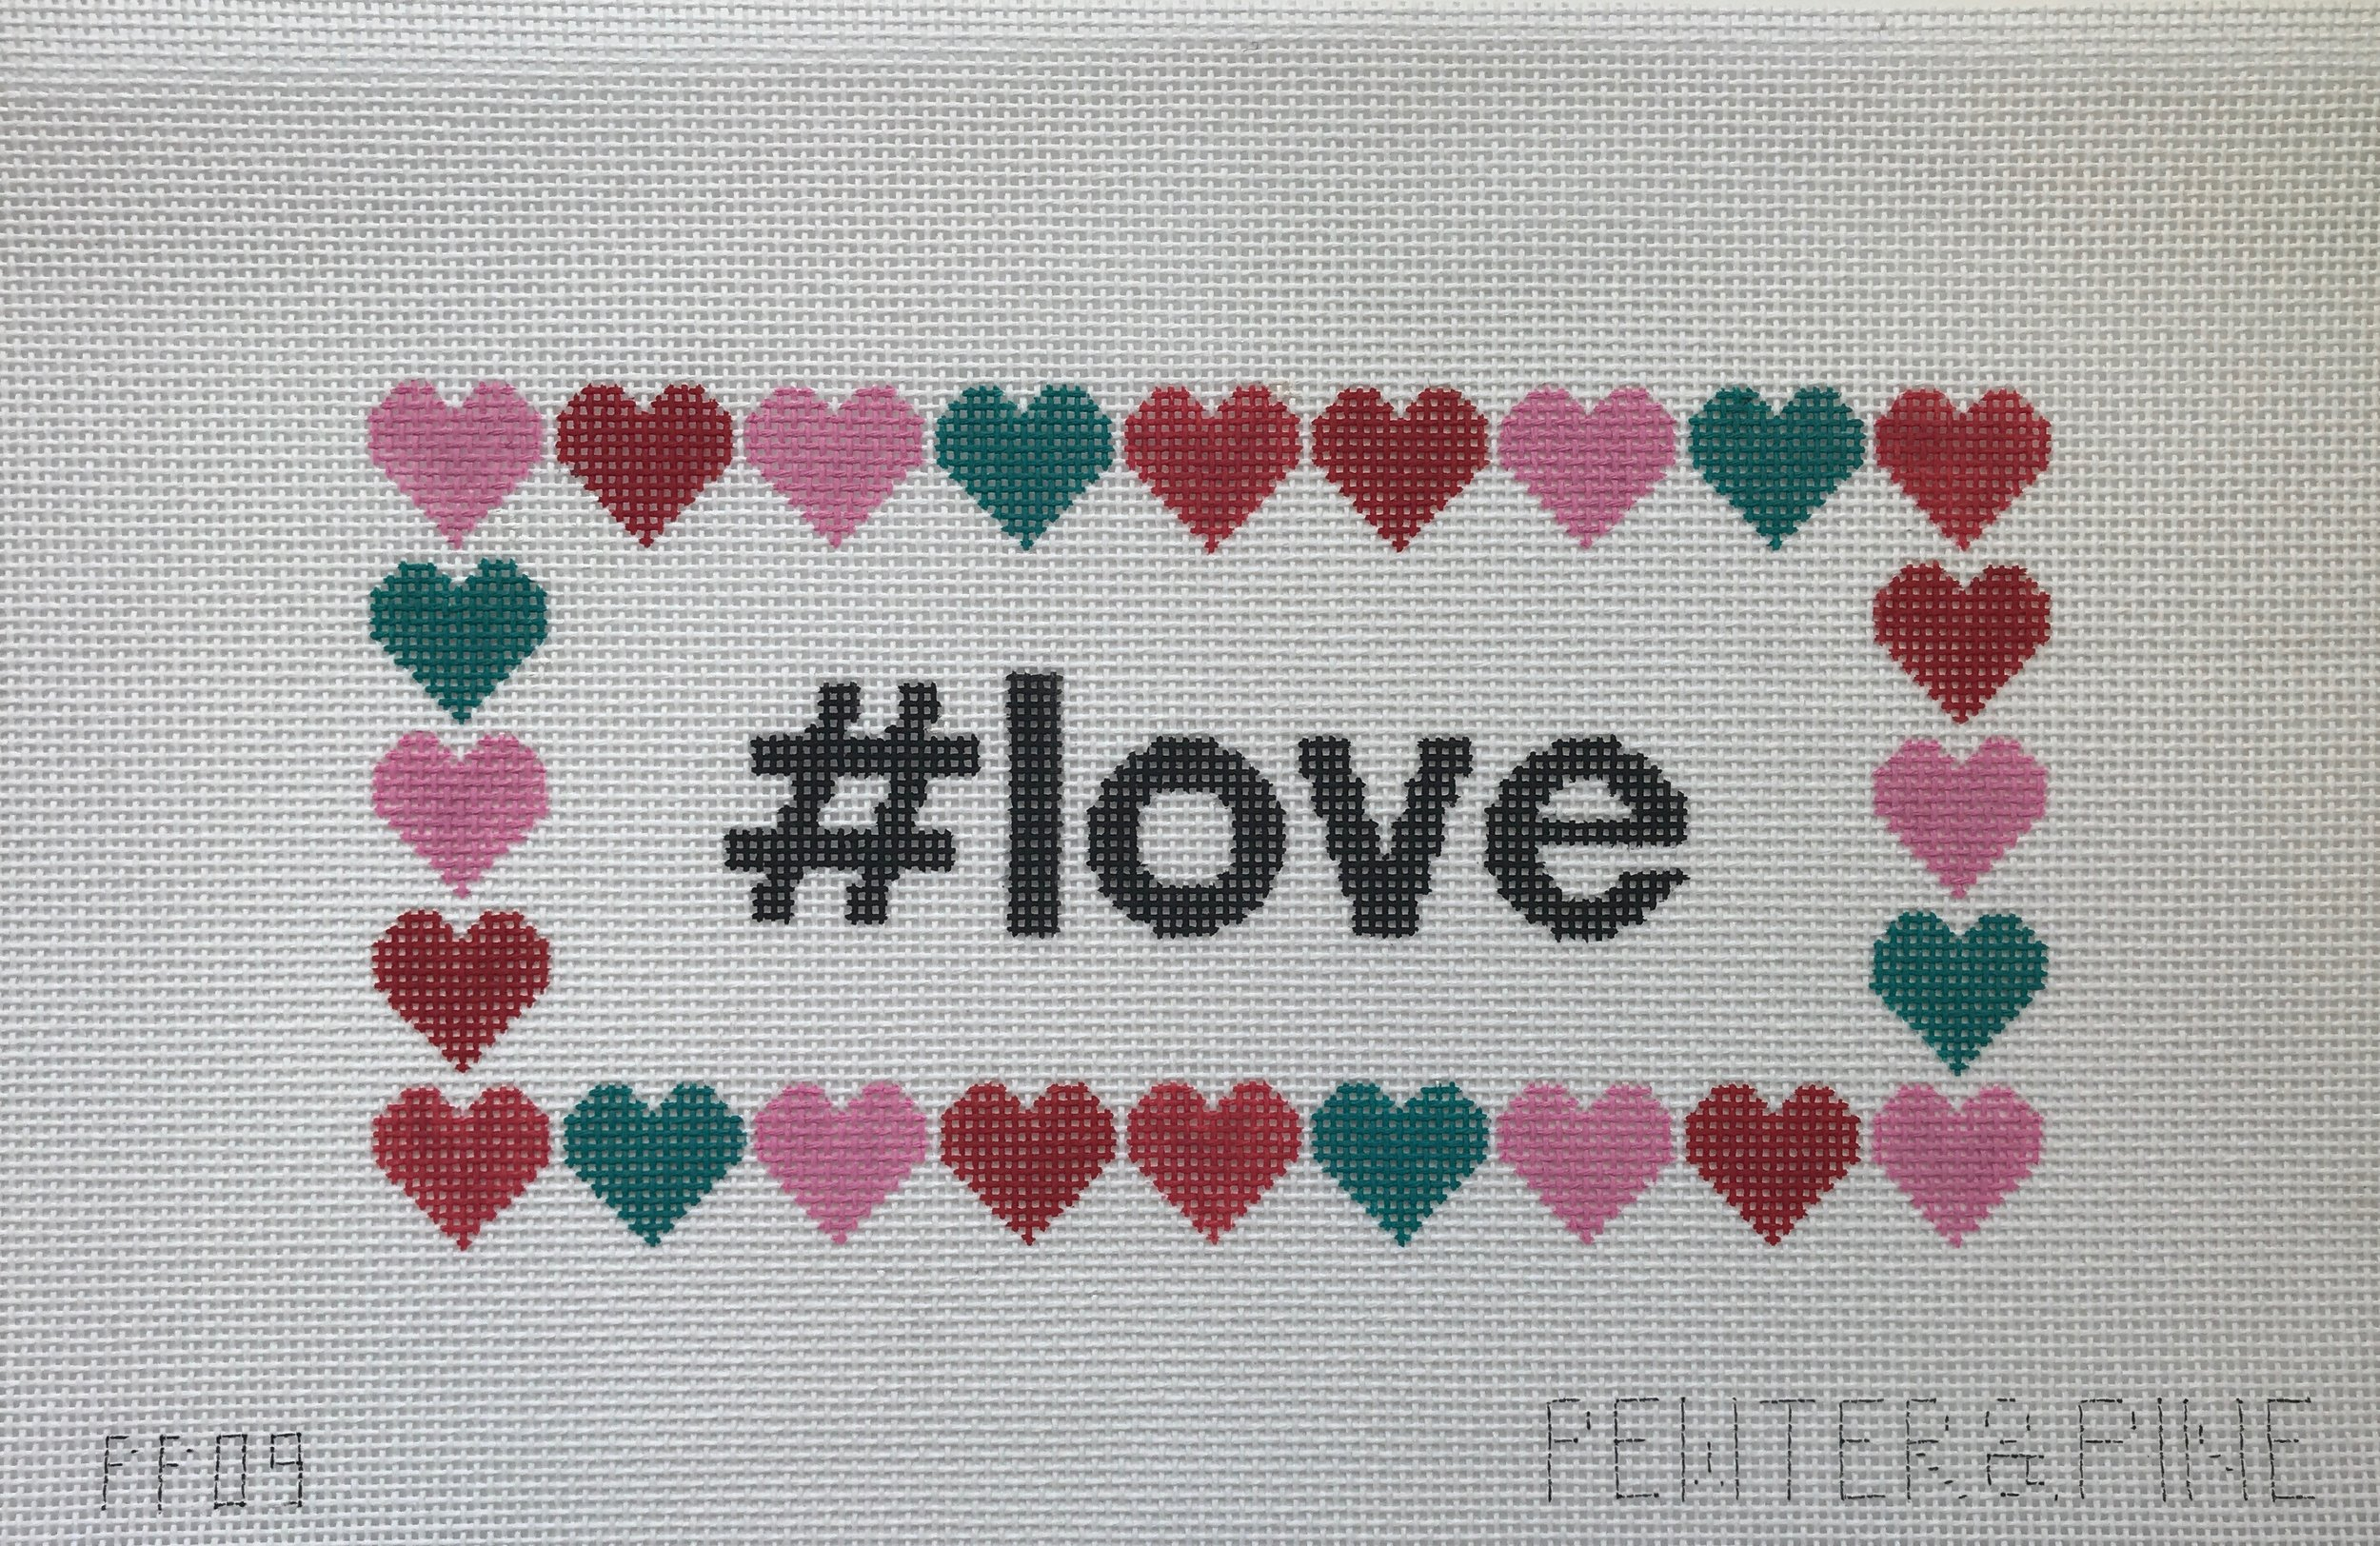 #Love - (PP09) 8.5